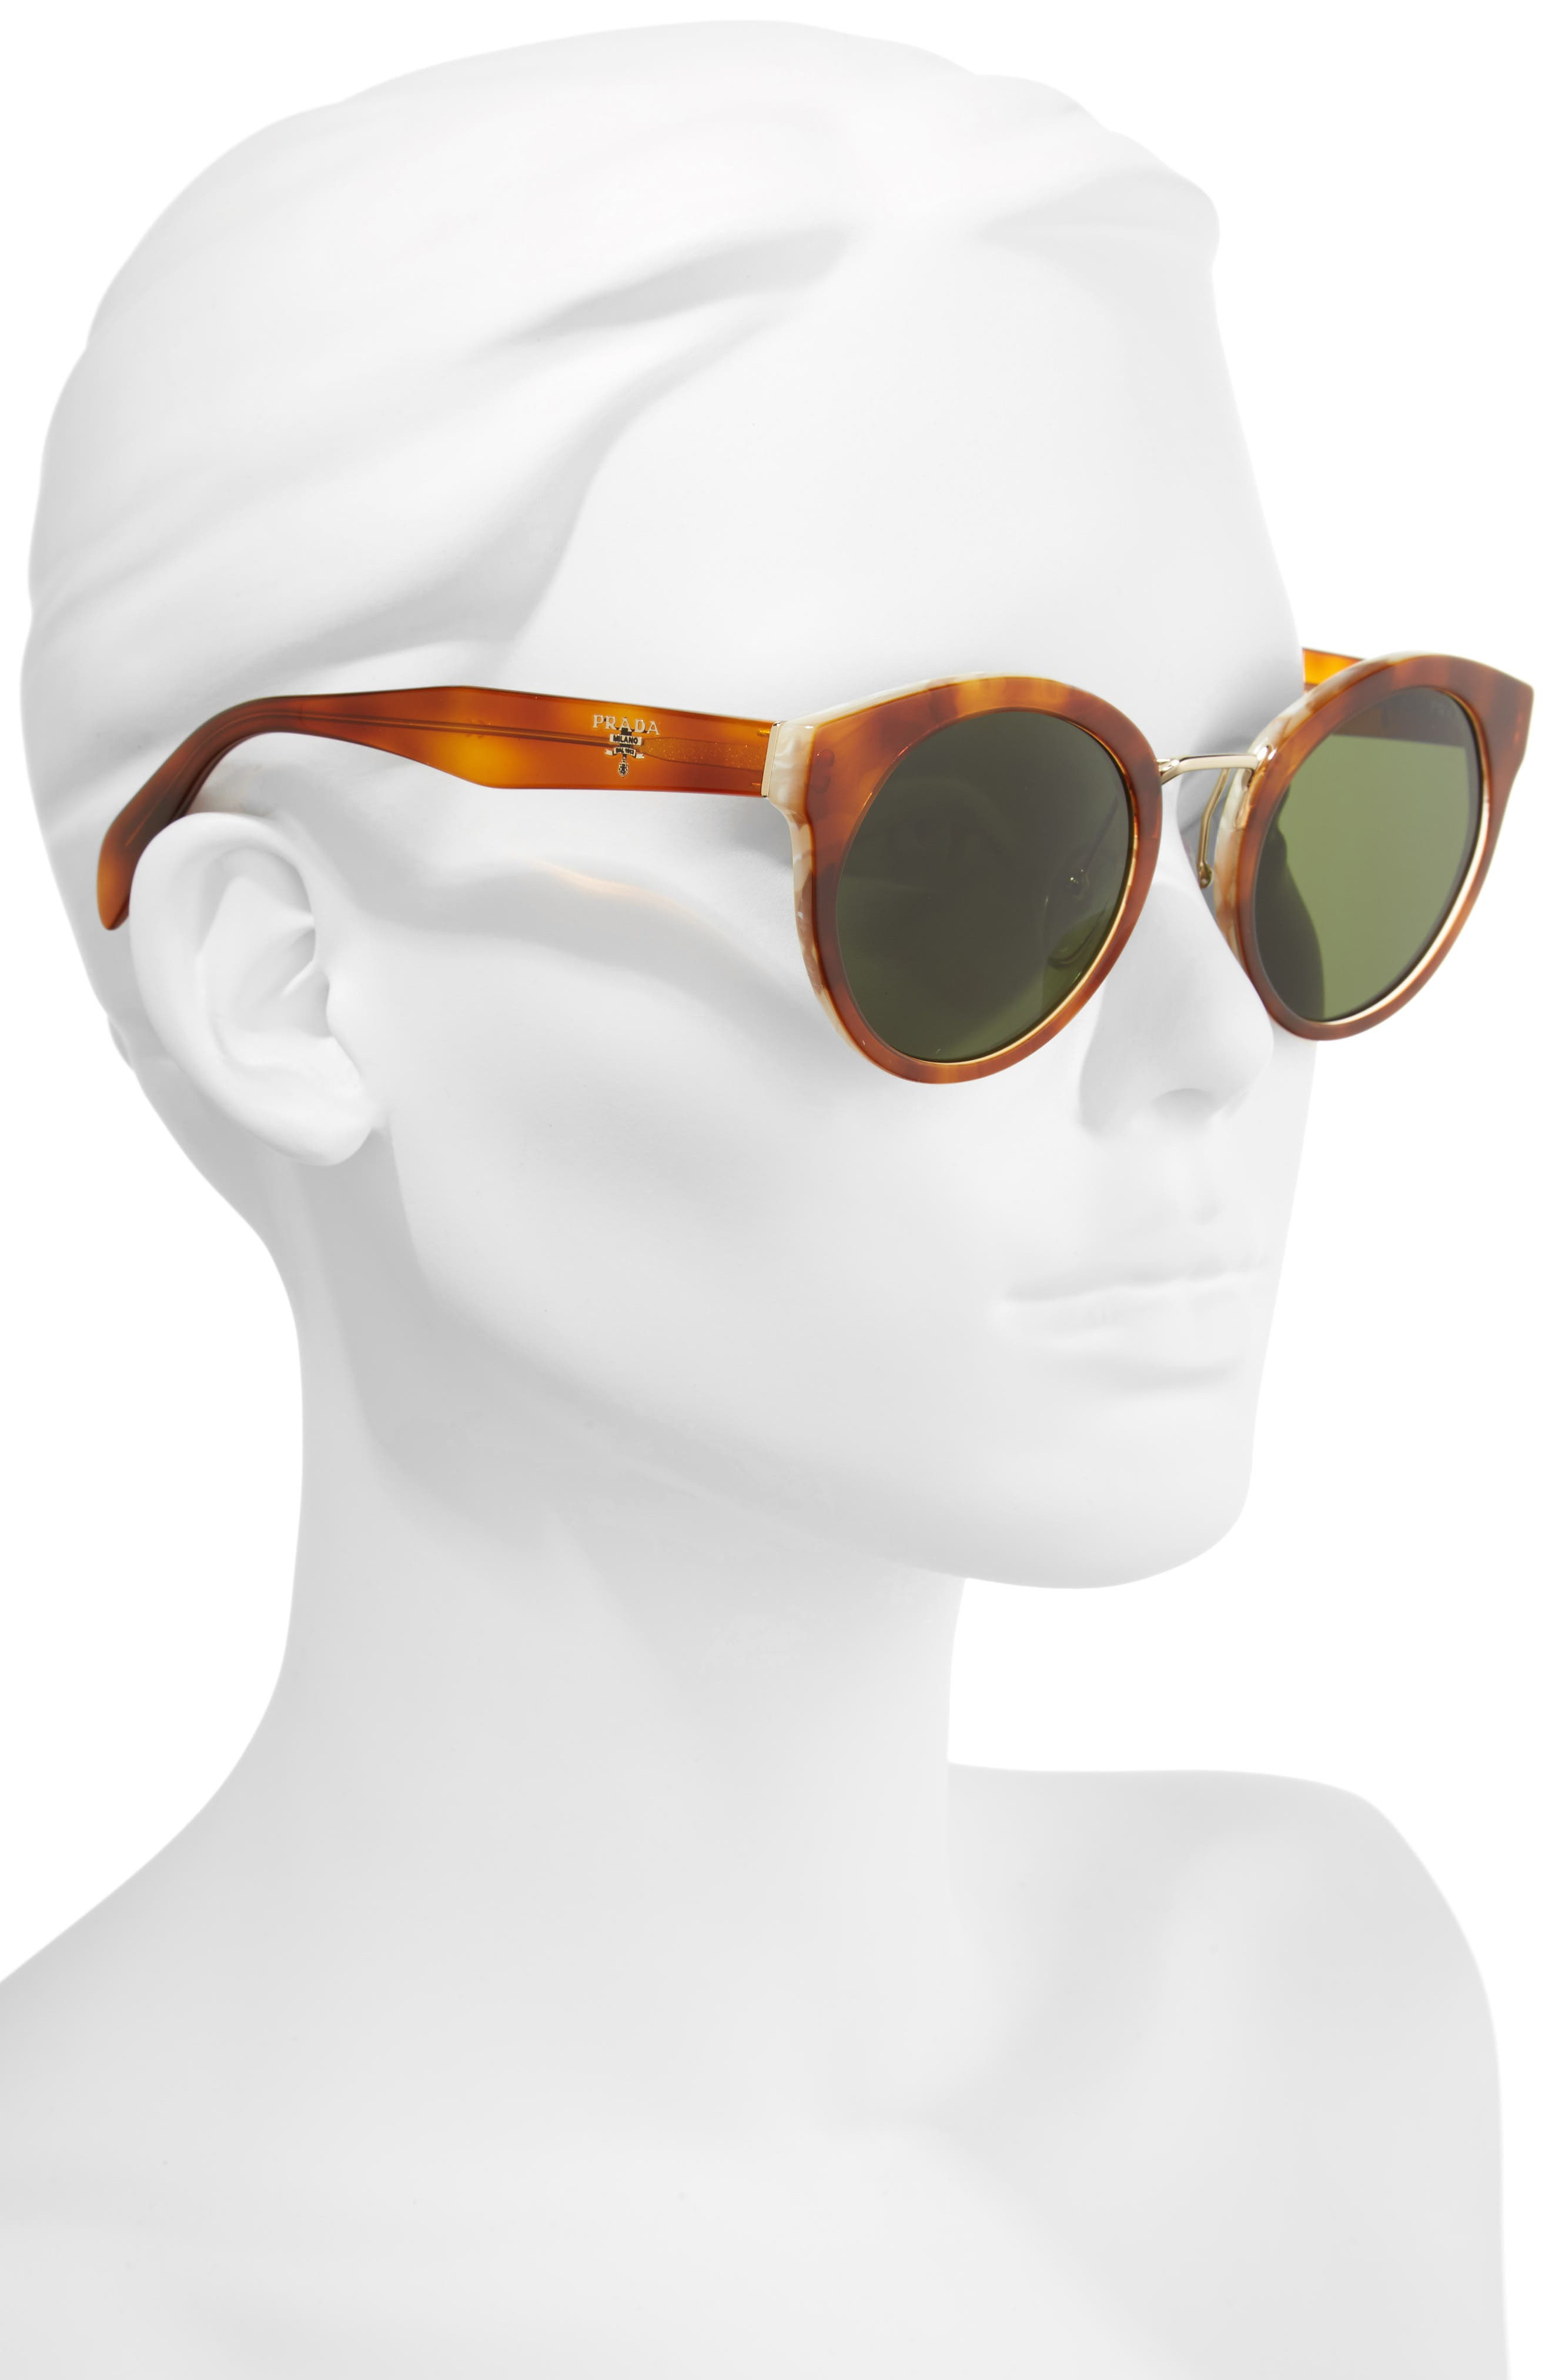 53mm Cat Eye Sunglasses,                             Alternate thumbnail 2, color,                             200